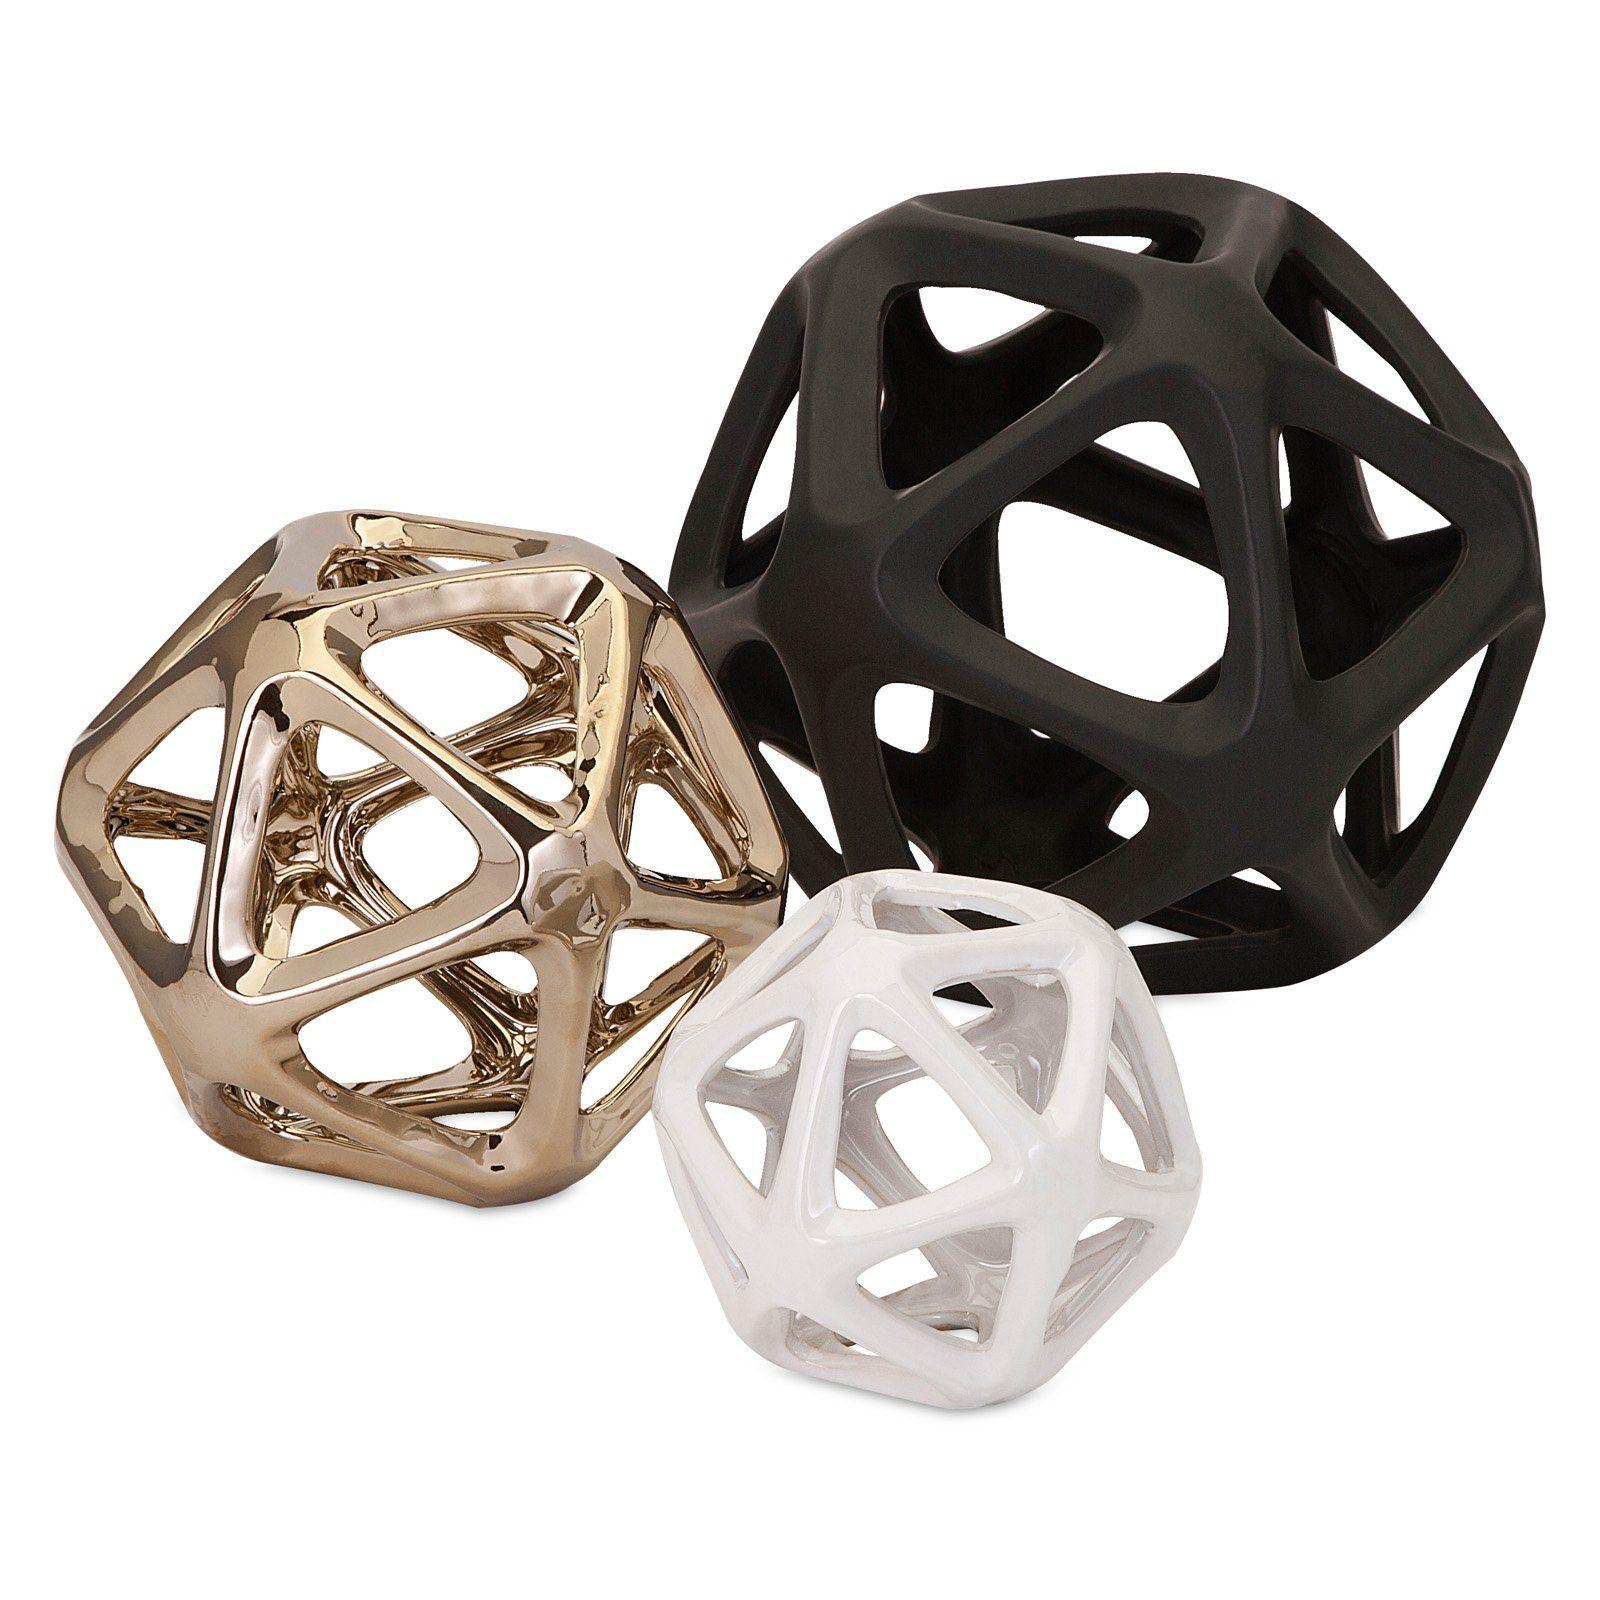 Black And White Decorative Ceramic Balls Nikki Chu Esceramic Decorative Ball  Set Of 3  Sculptures